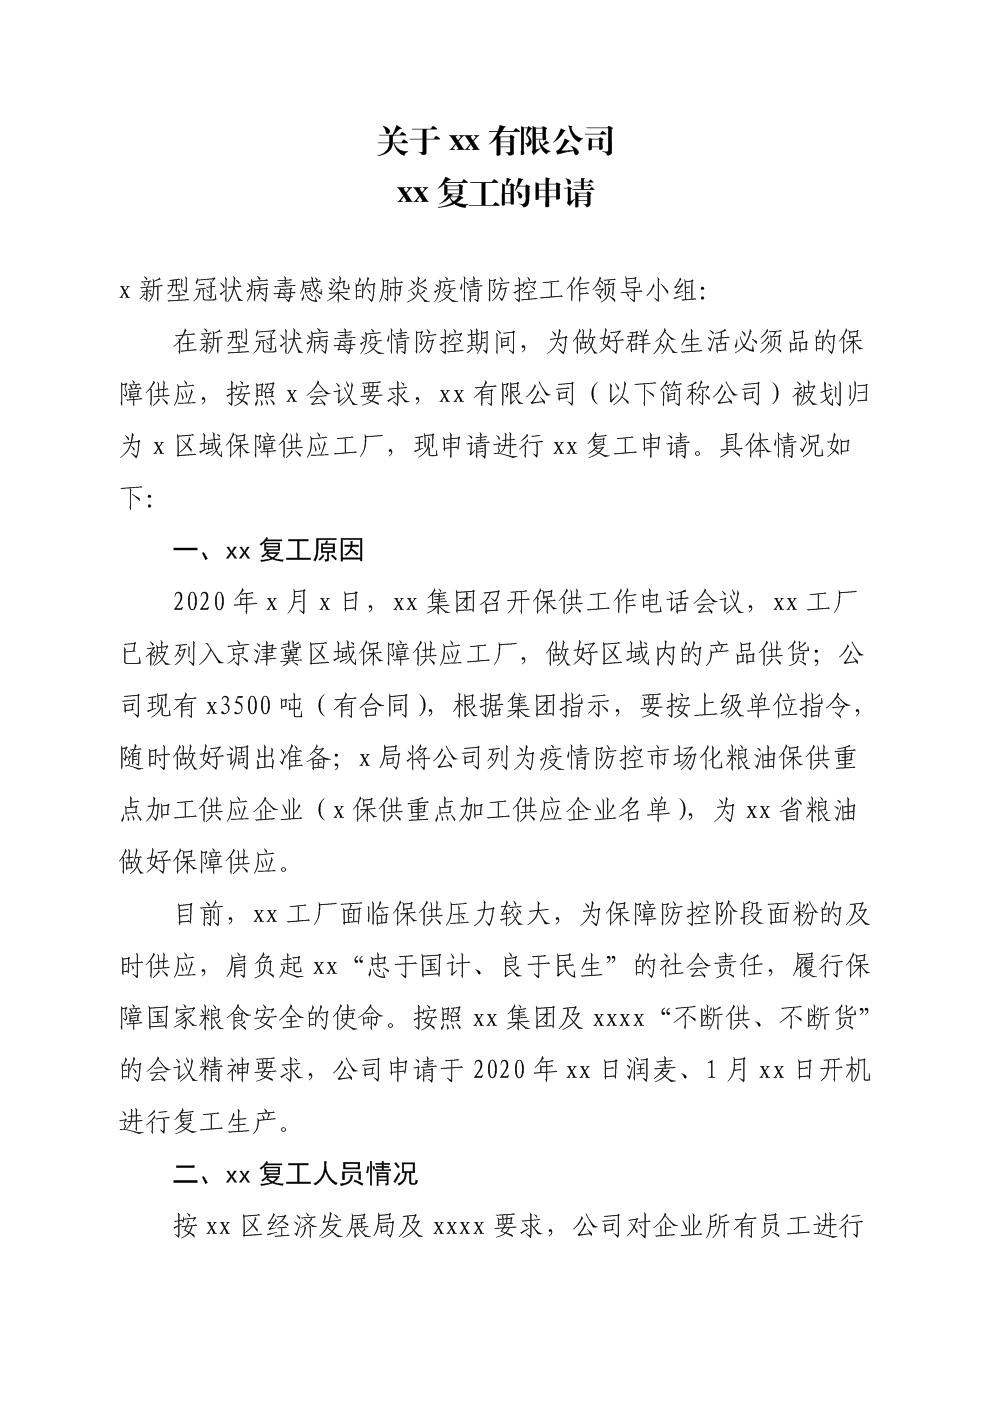 xxx有限公司疫情期间复工的申请模版.docx